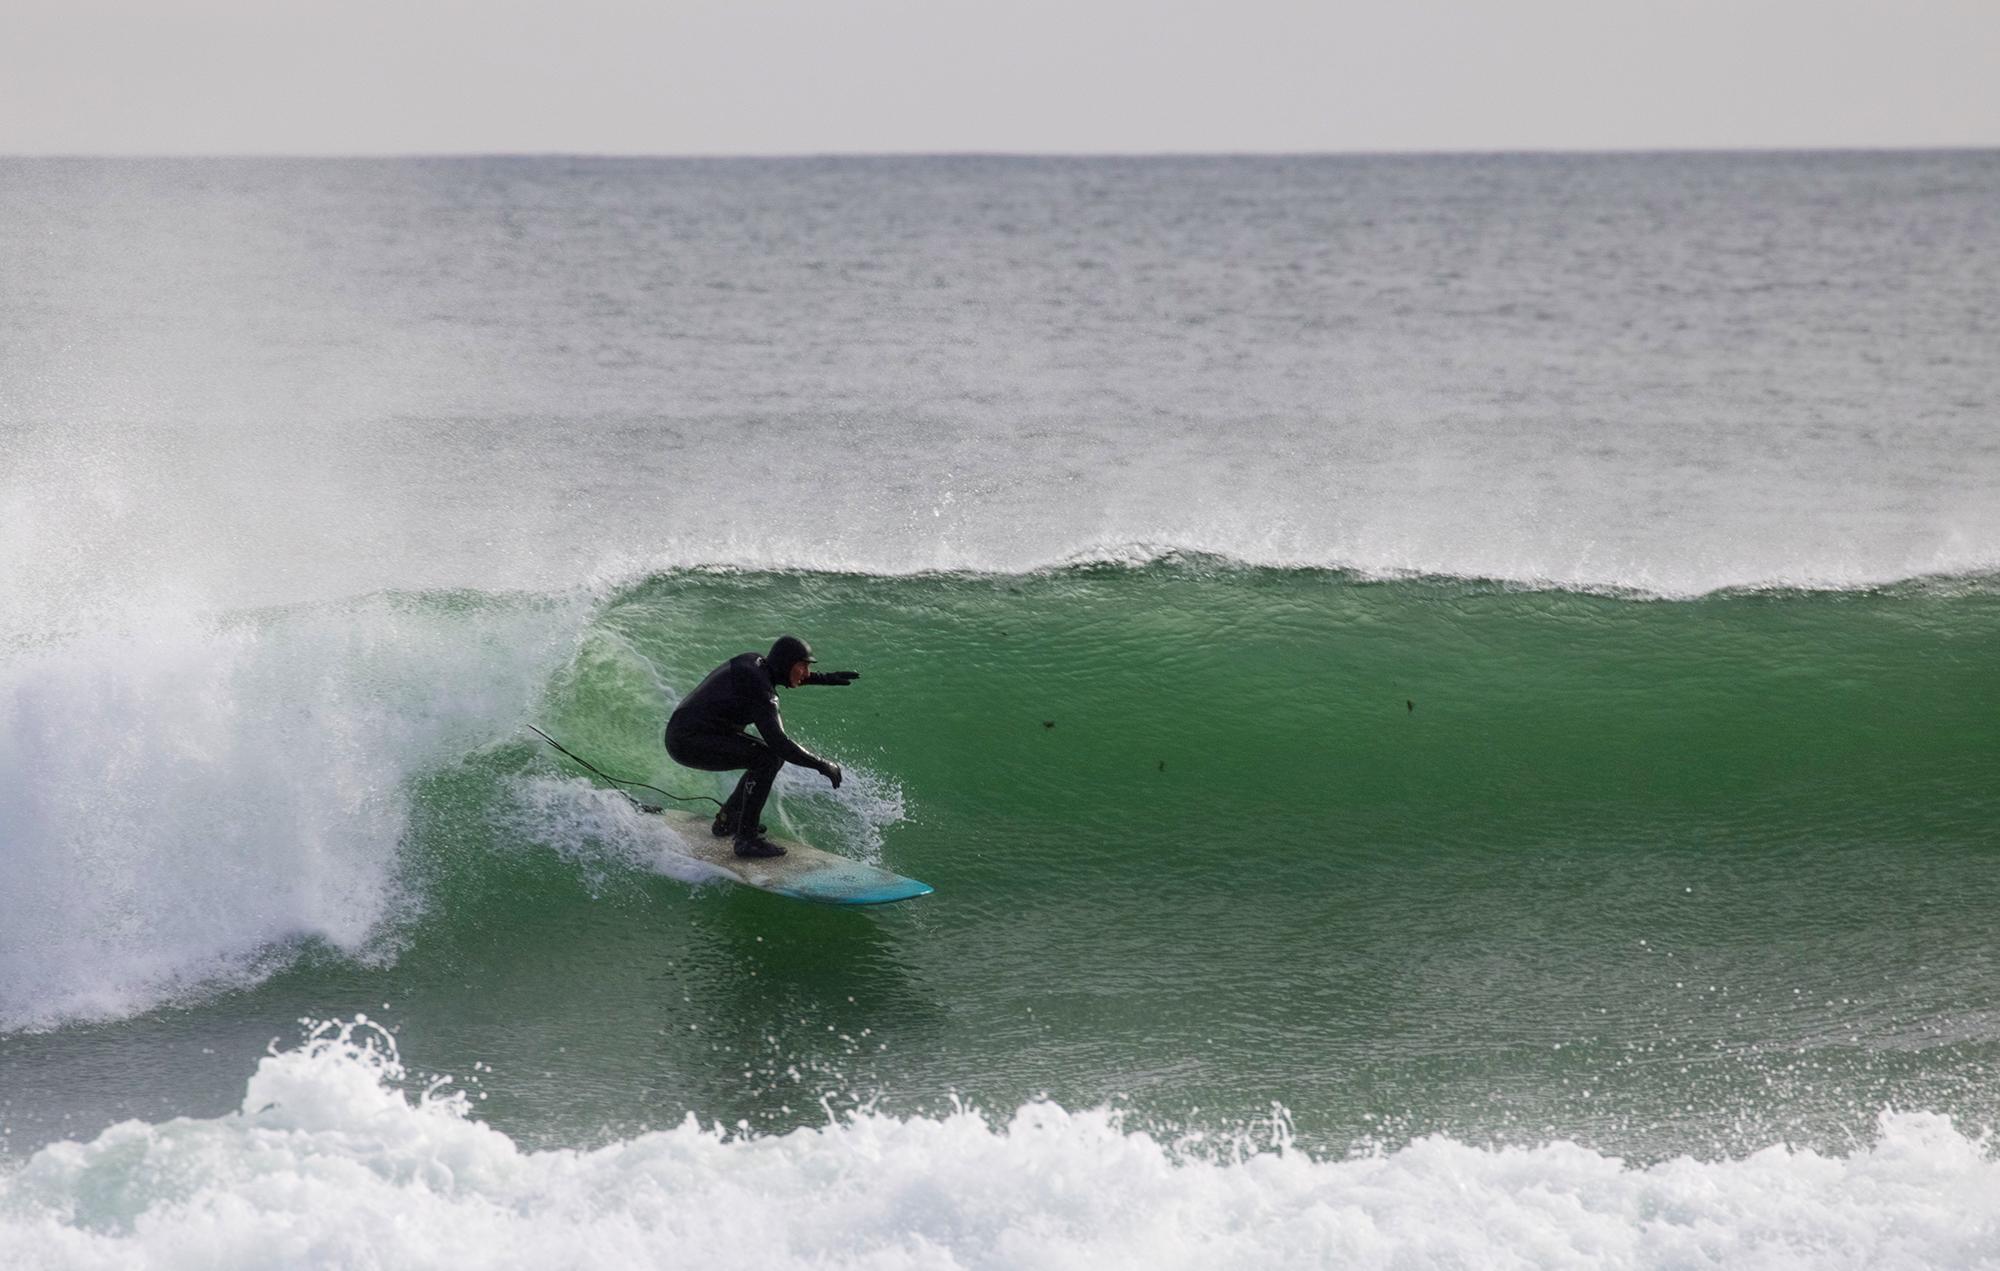 1-19-17 MTK Surfer 17.jpg